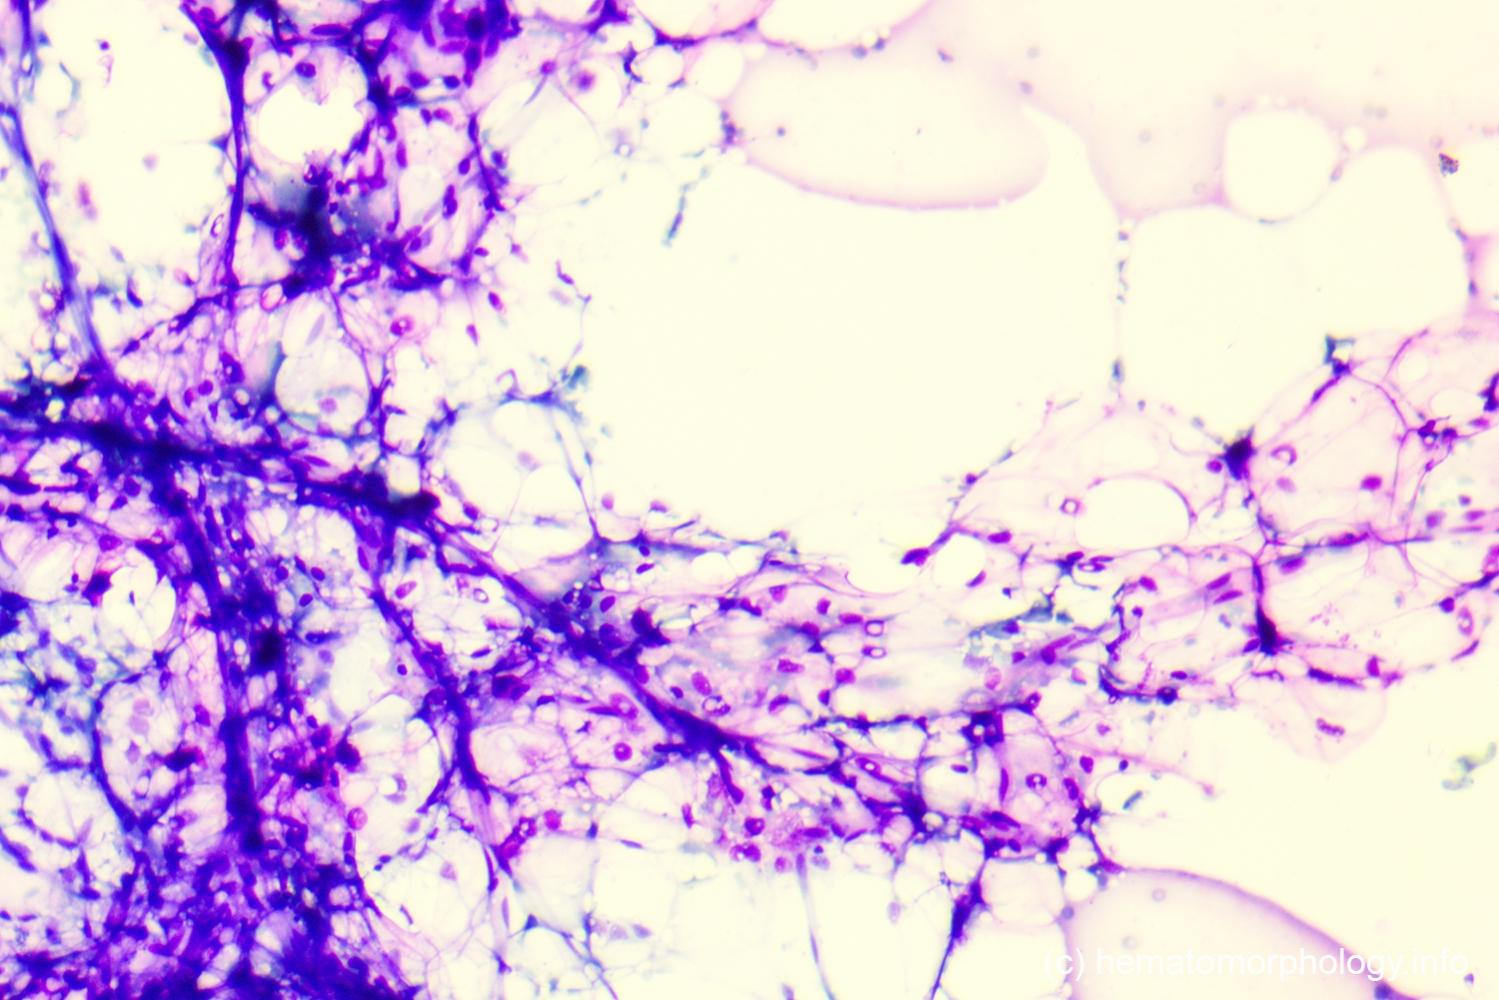 Aplastische anemie. A aplastische anemie.